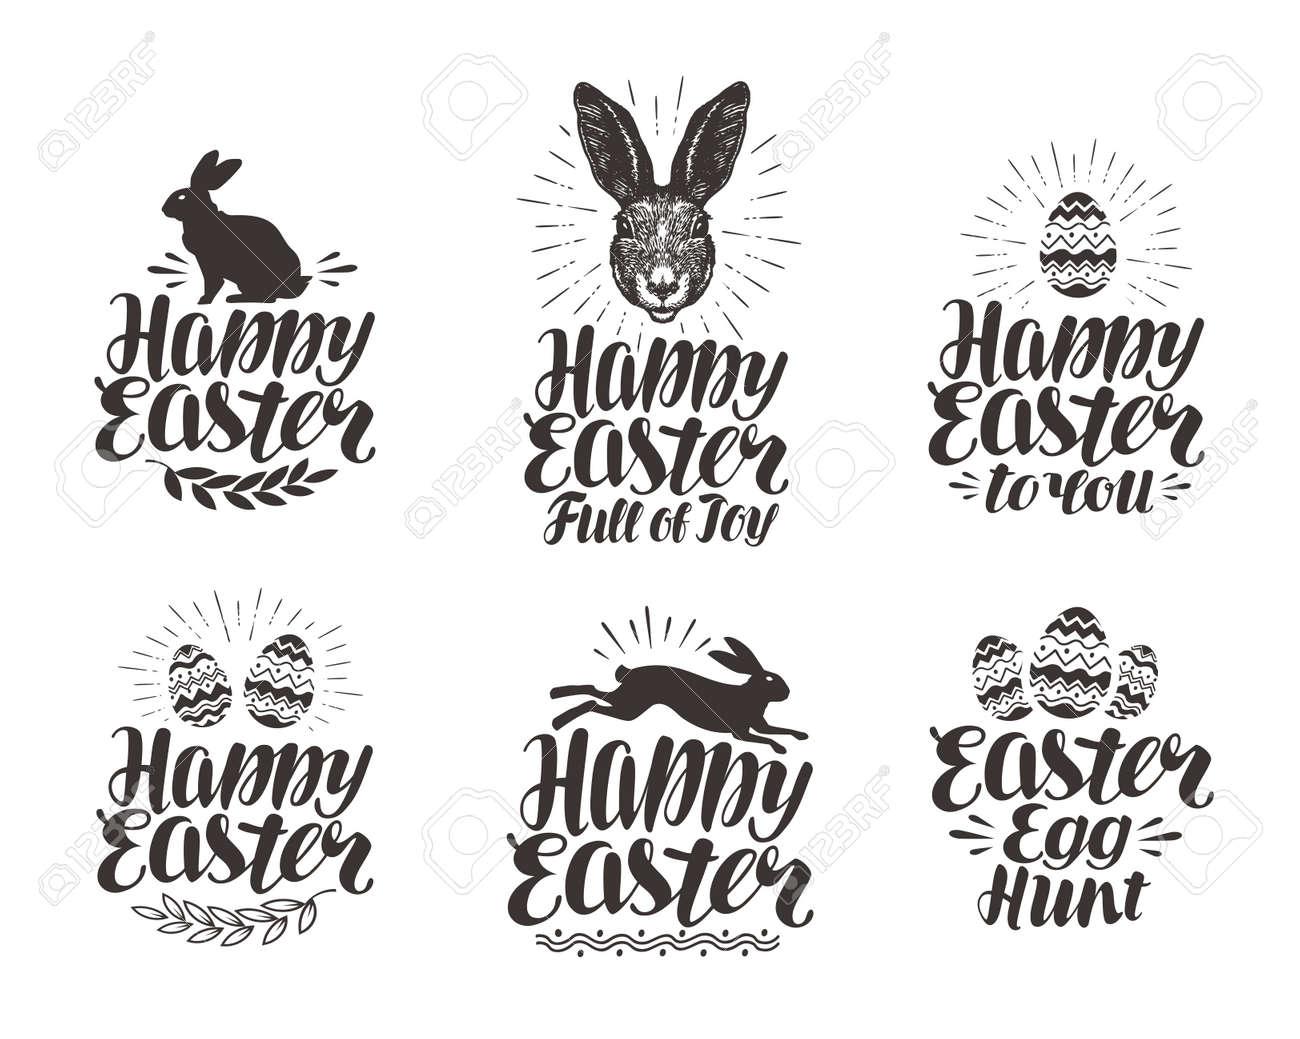 Happy Easter, label set. Egg, rabbit, bunny symbol. Lettering, calligraphy vector illustration - 74560035